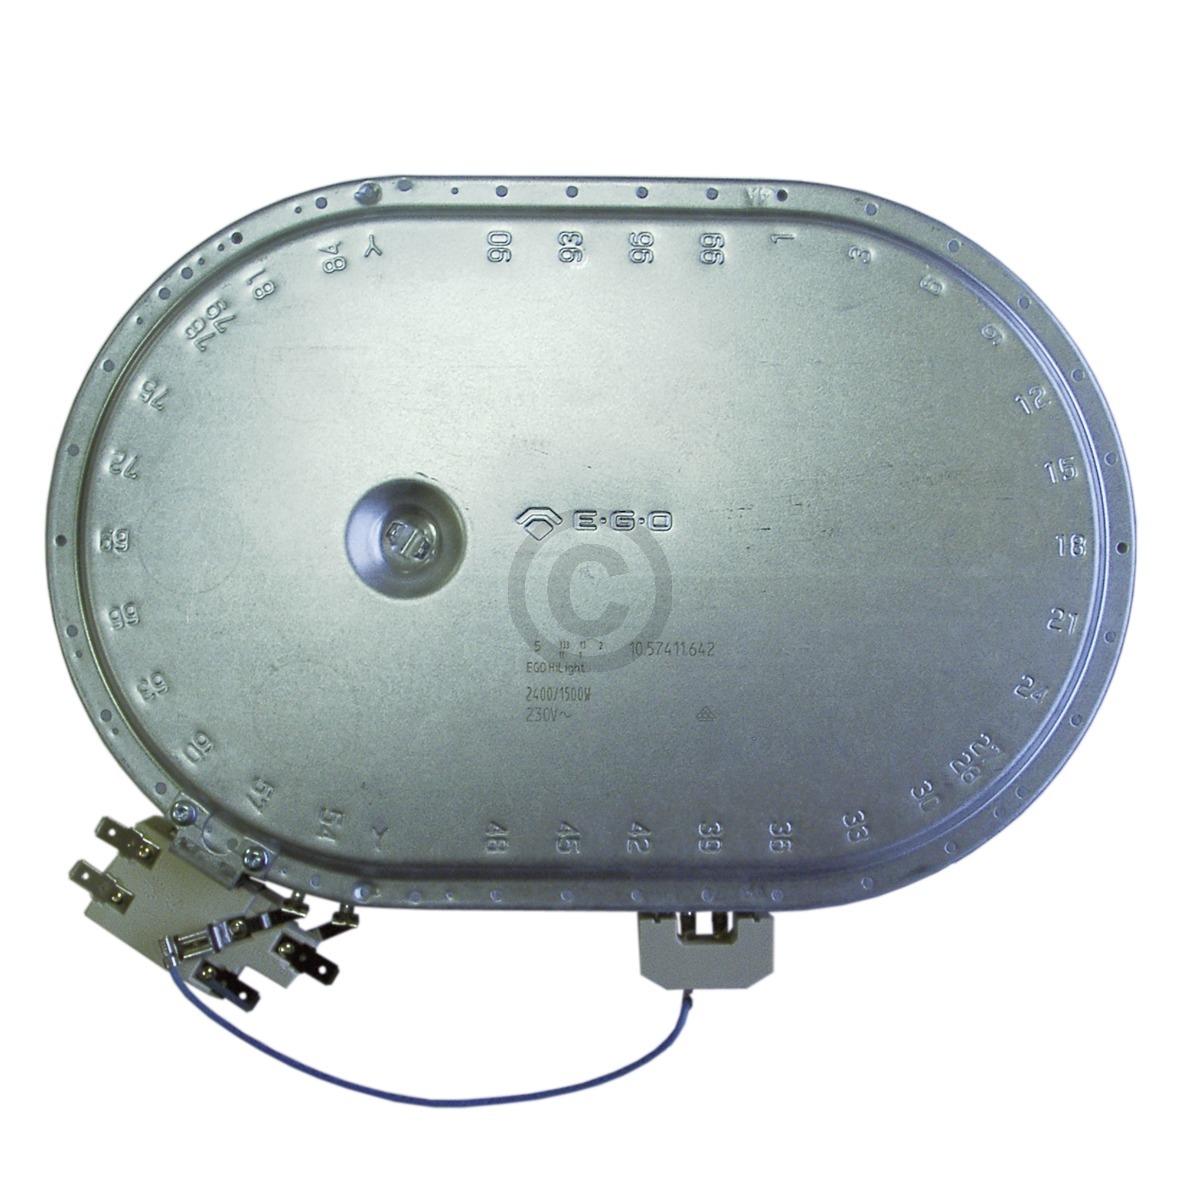 Strahlheizkörper 265x170mm 2400/1500W 230V oval 374063926 AEG, Electrolux, Juno,